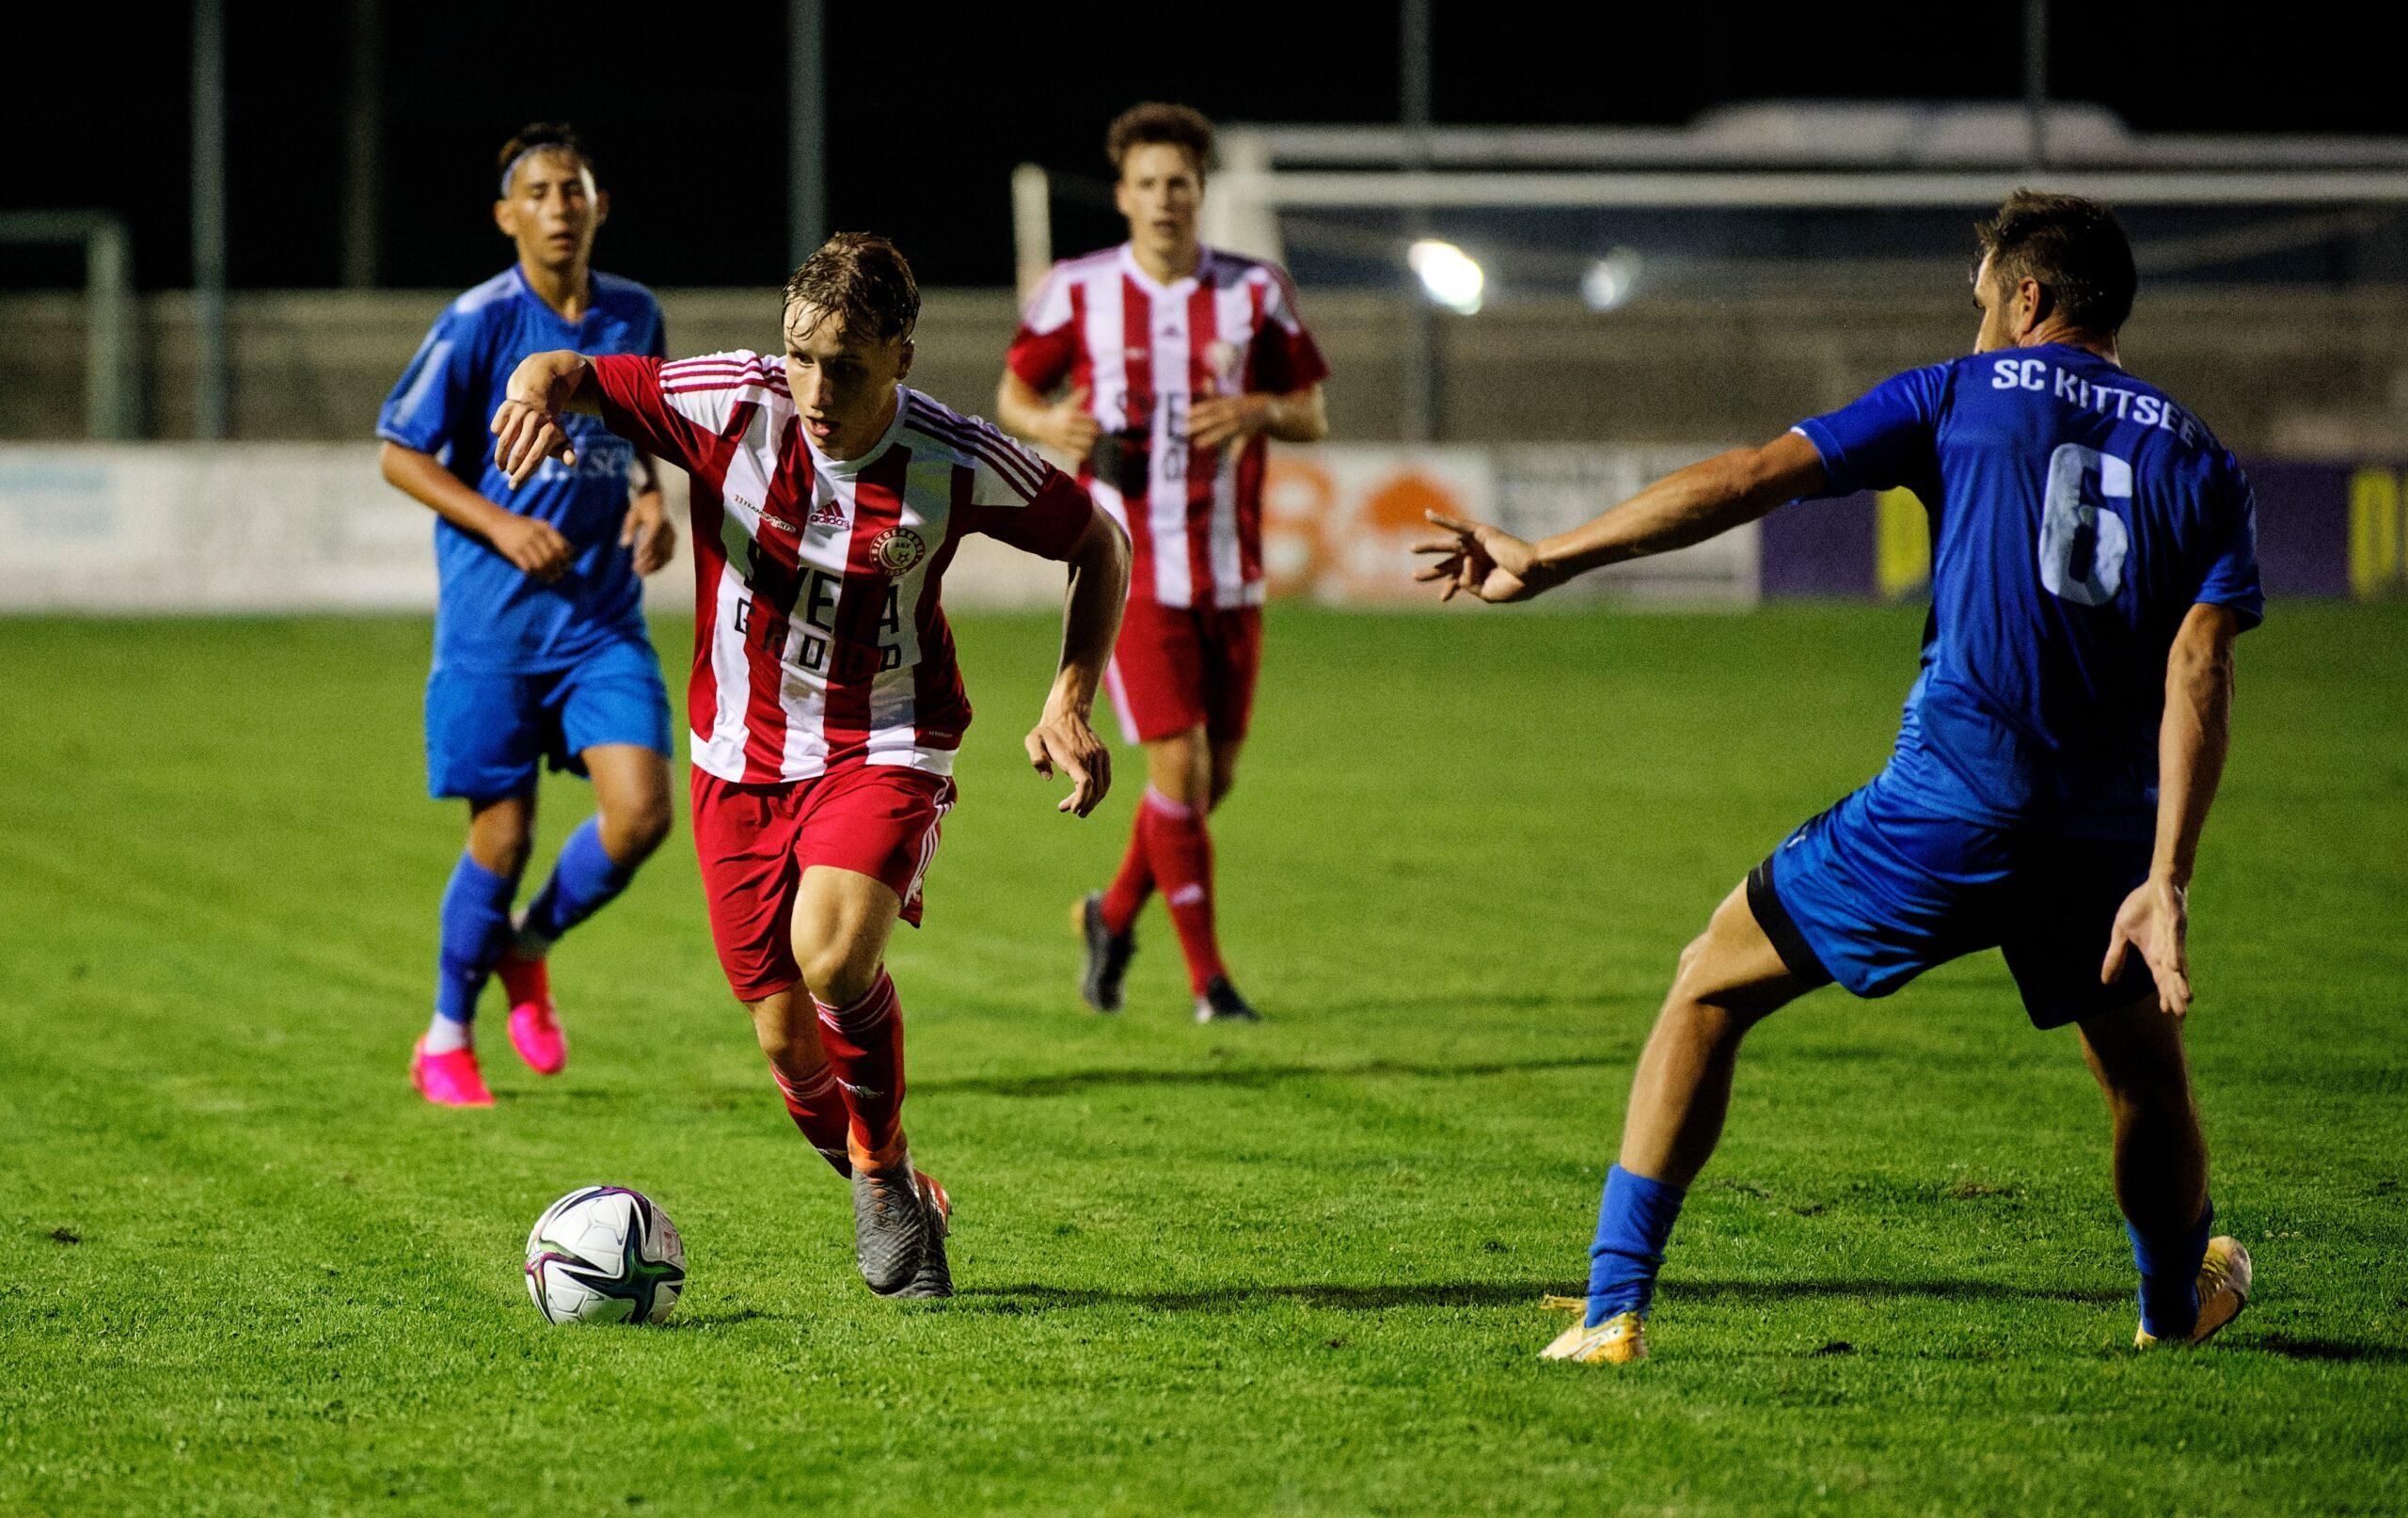 Lucas Secco splits Kittsee defence